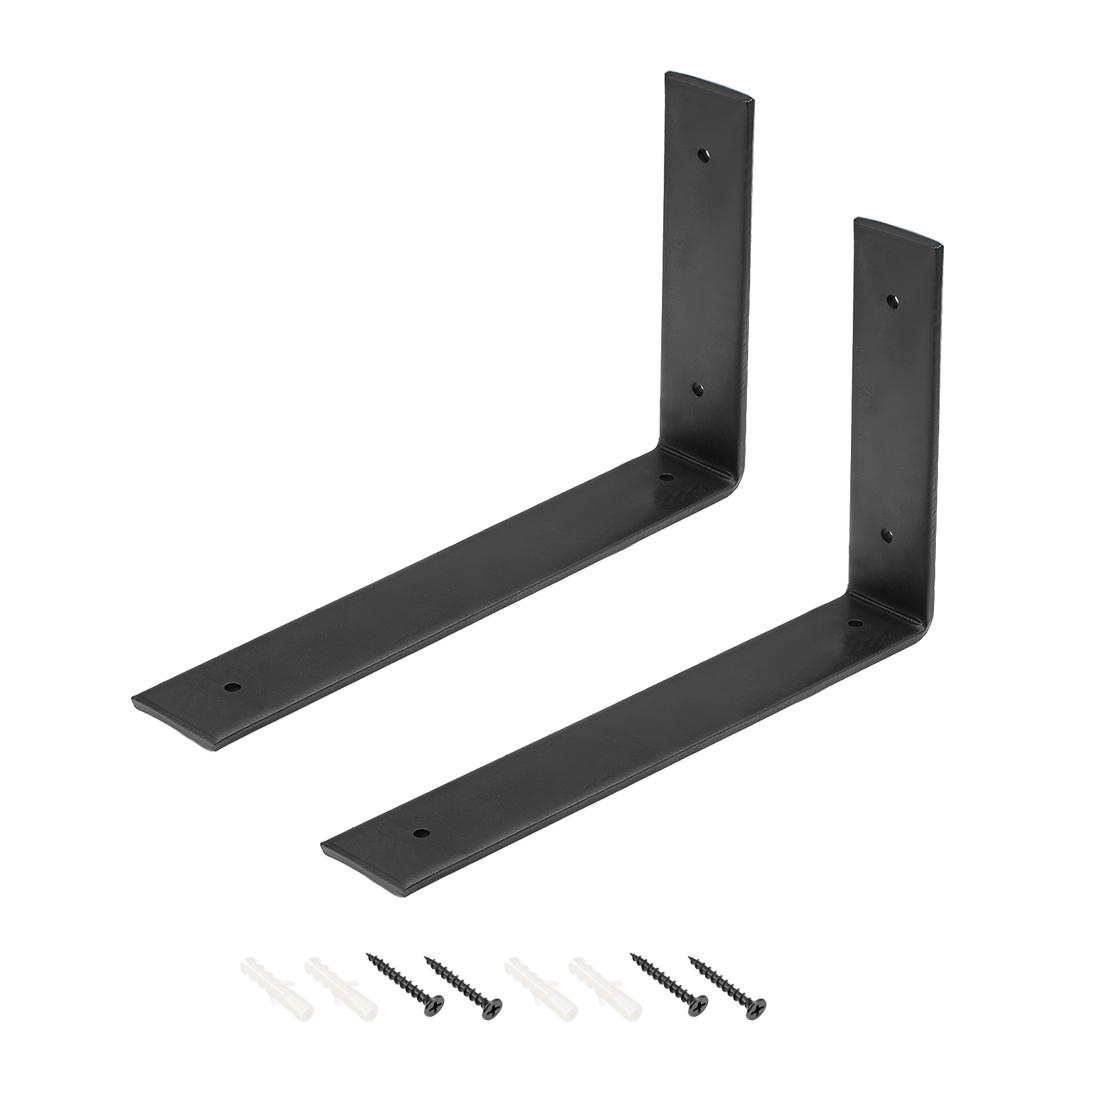 Wall Shelf Brackets Heavy-duty 10-inch x 6-inch Shelf Support Corner Brace 2pcs